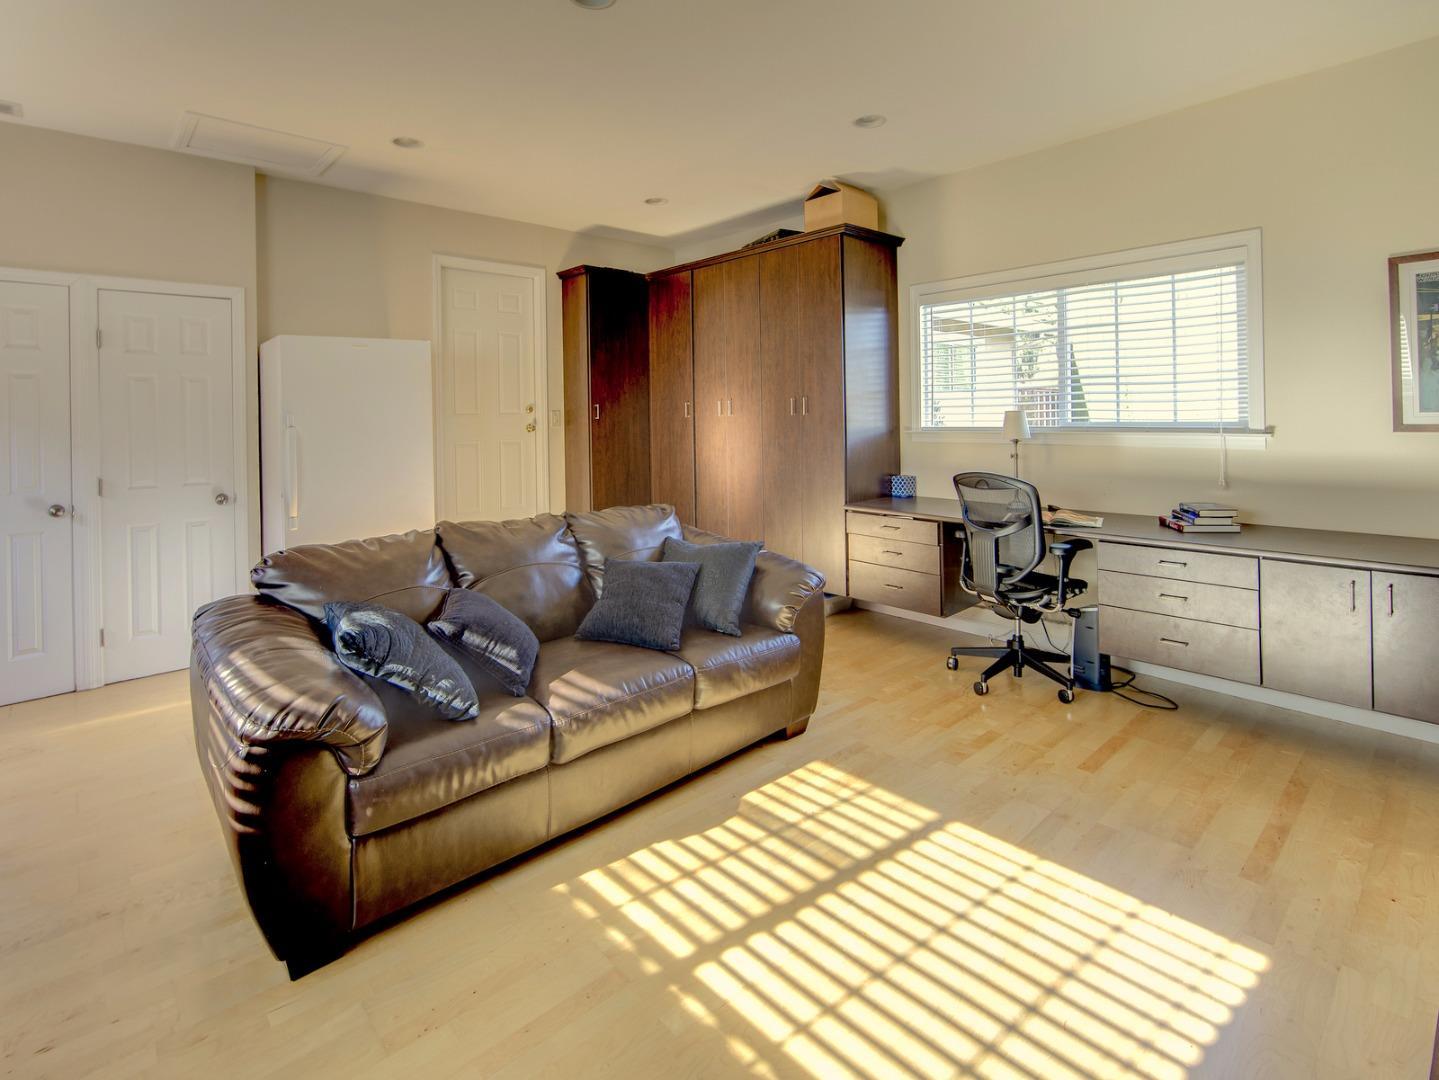 6534 Camden Avenue, San Jose, CA 95120 $950,000 Www.lupesilvahomes.com  MLS#81561890